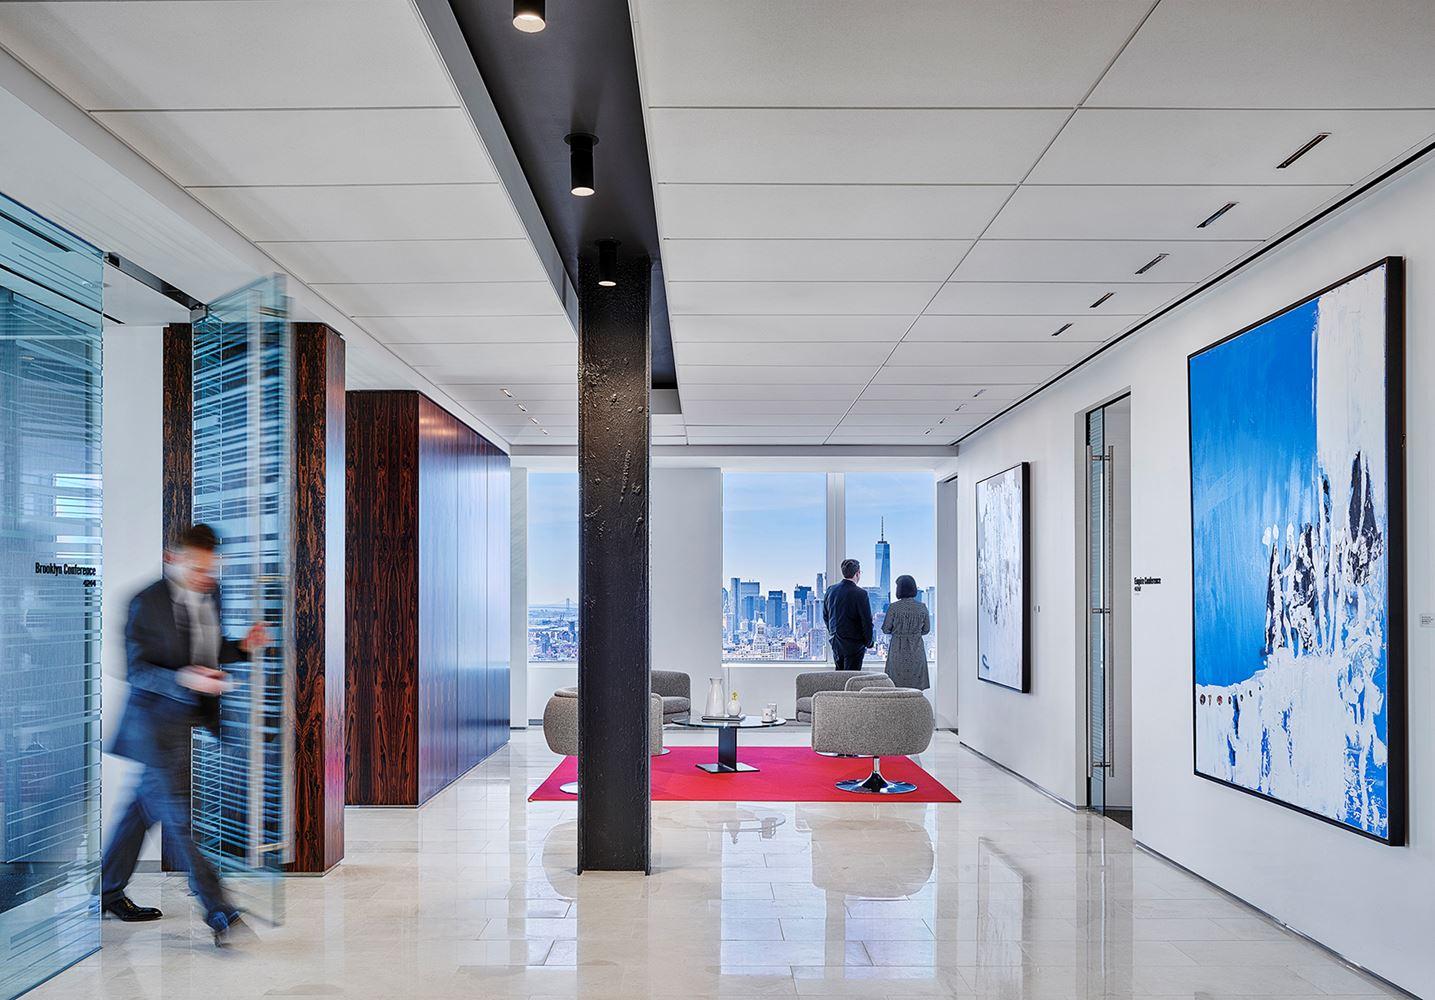 Aia kansas city interior architecture merit for Office design kansas city